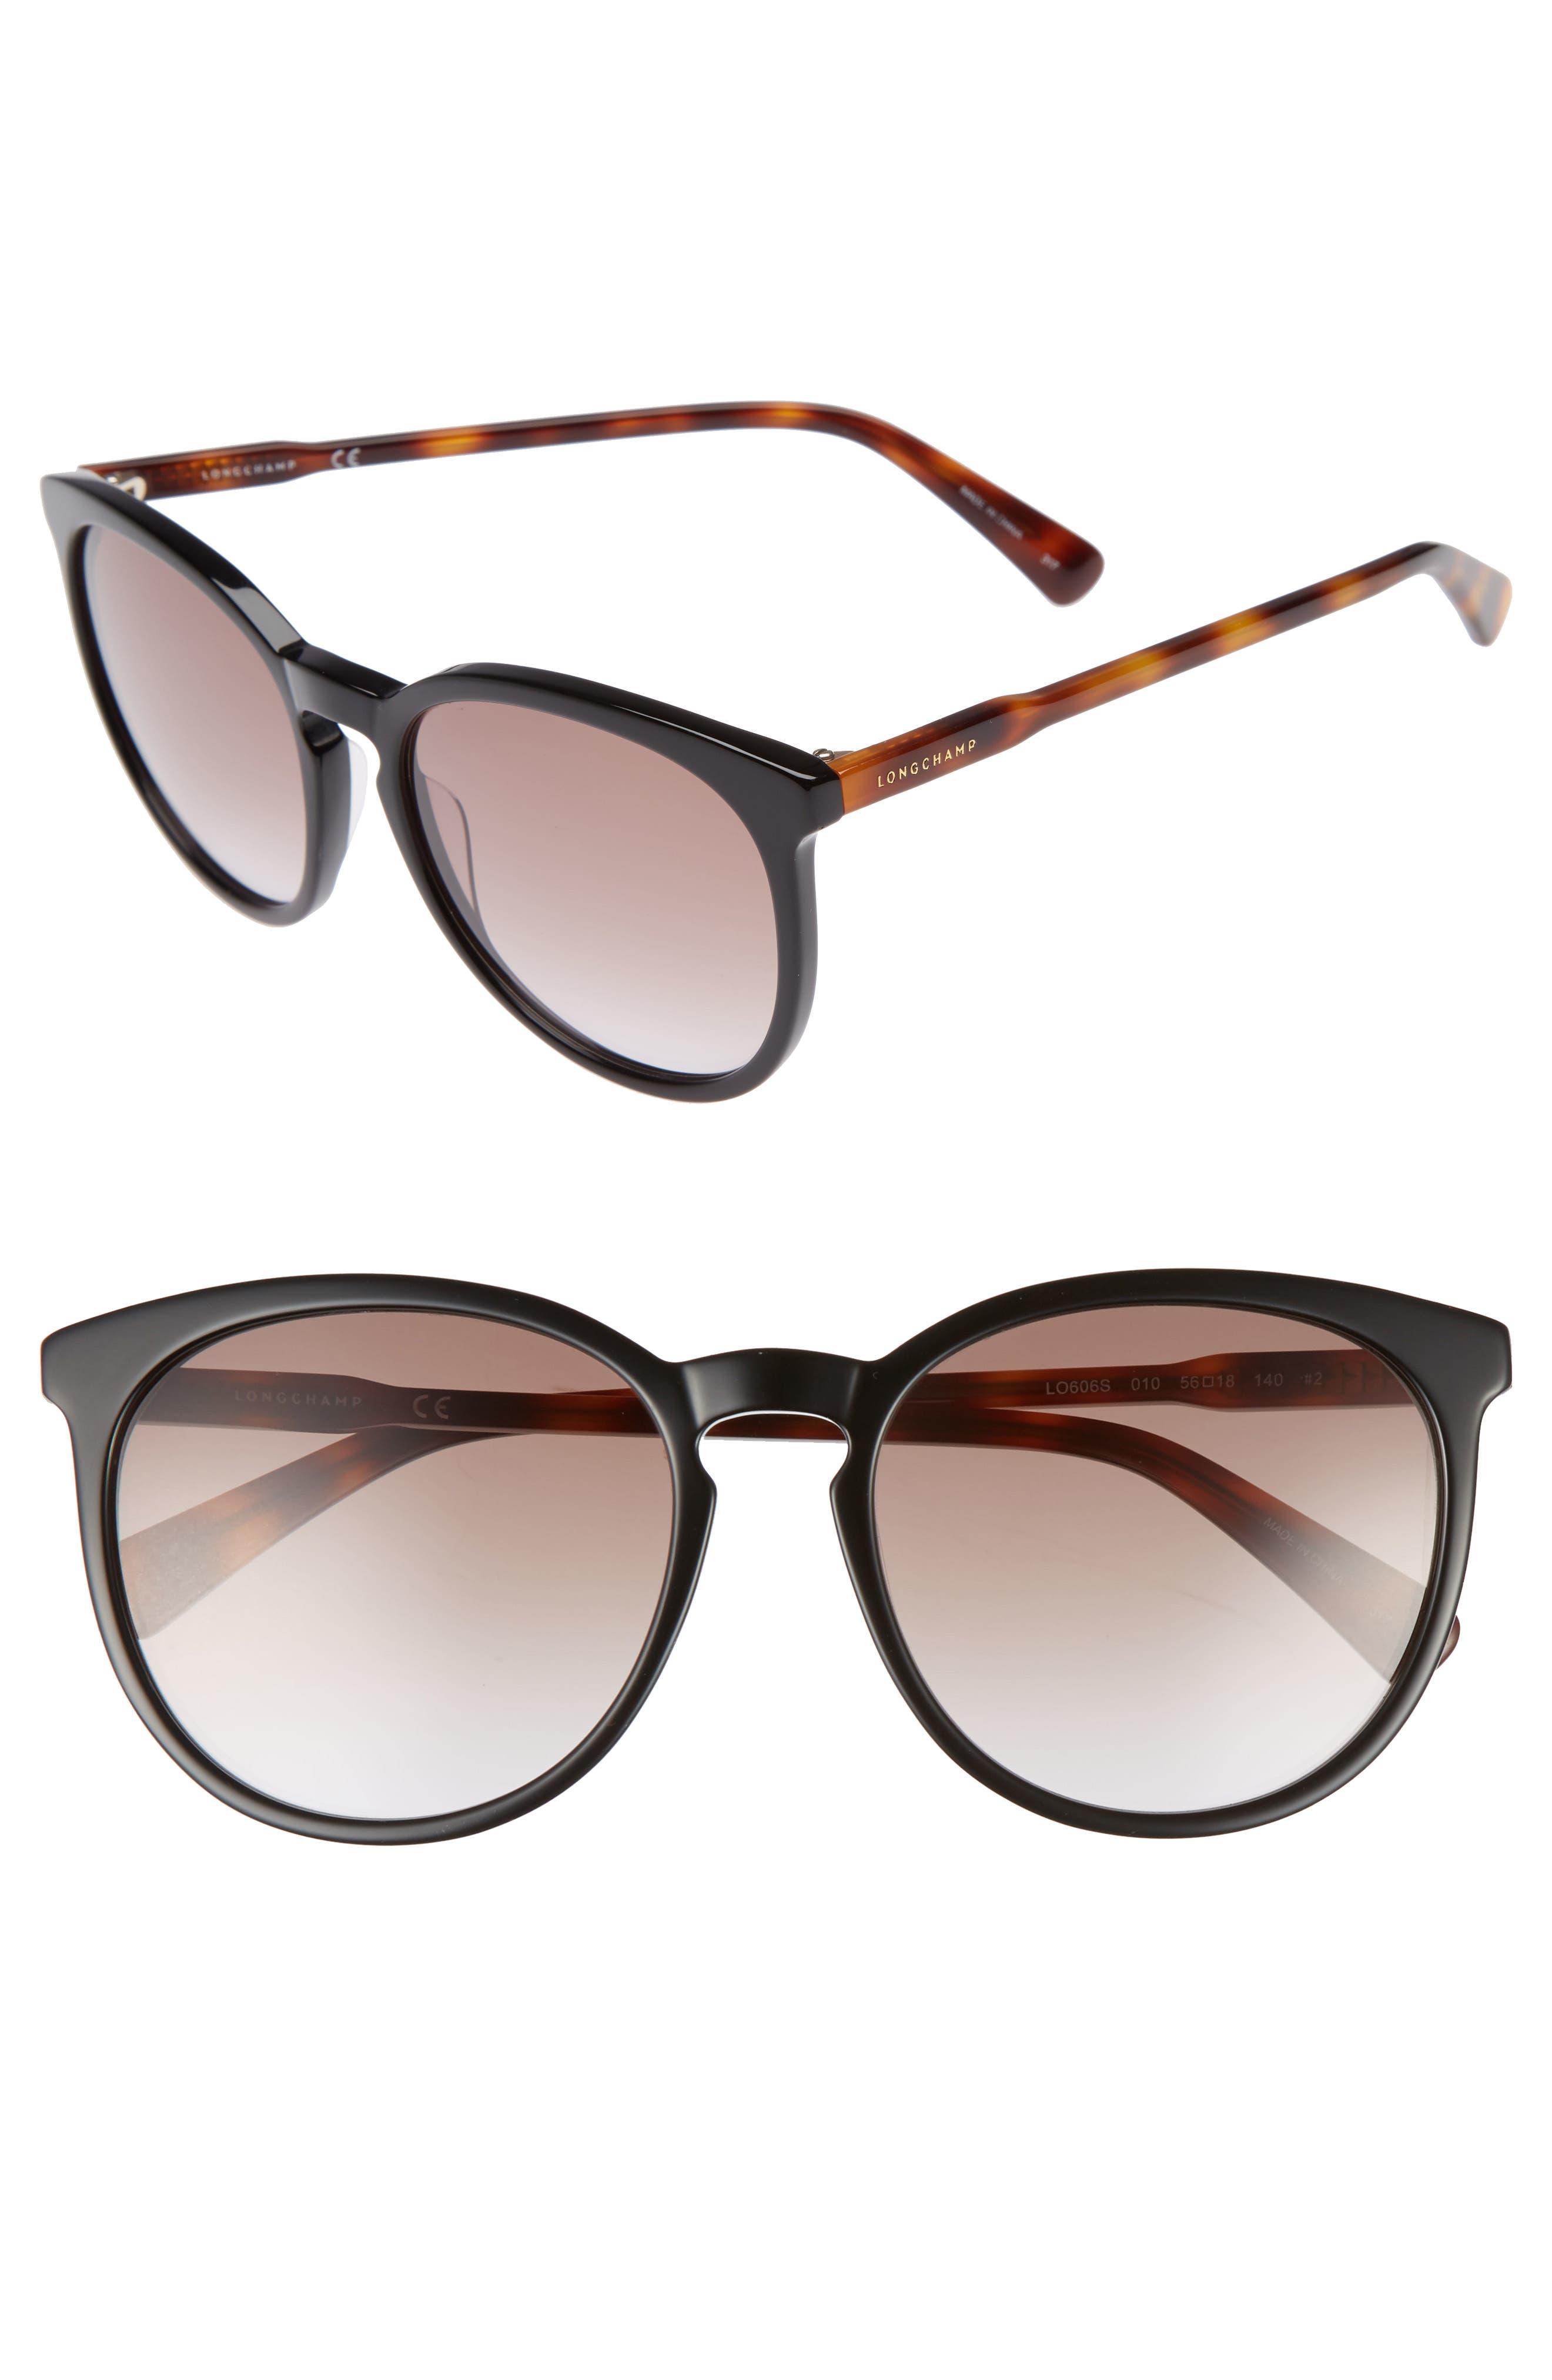 56mm Round Sunglasses,                         Main,                         color, BLACK/ HAVANA